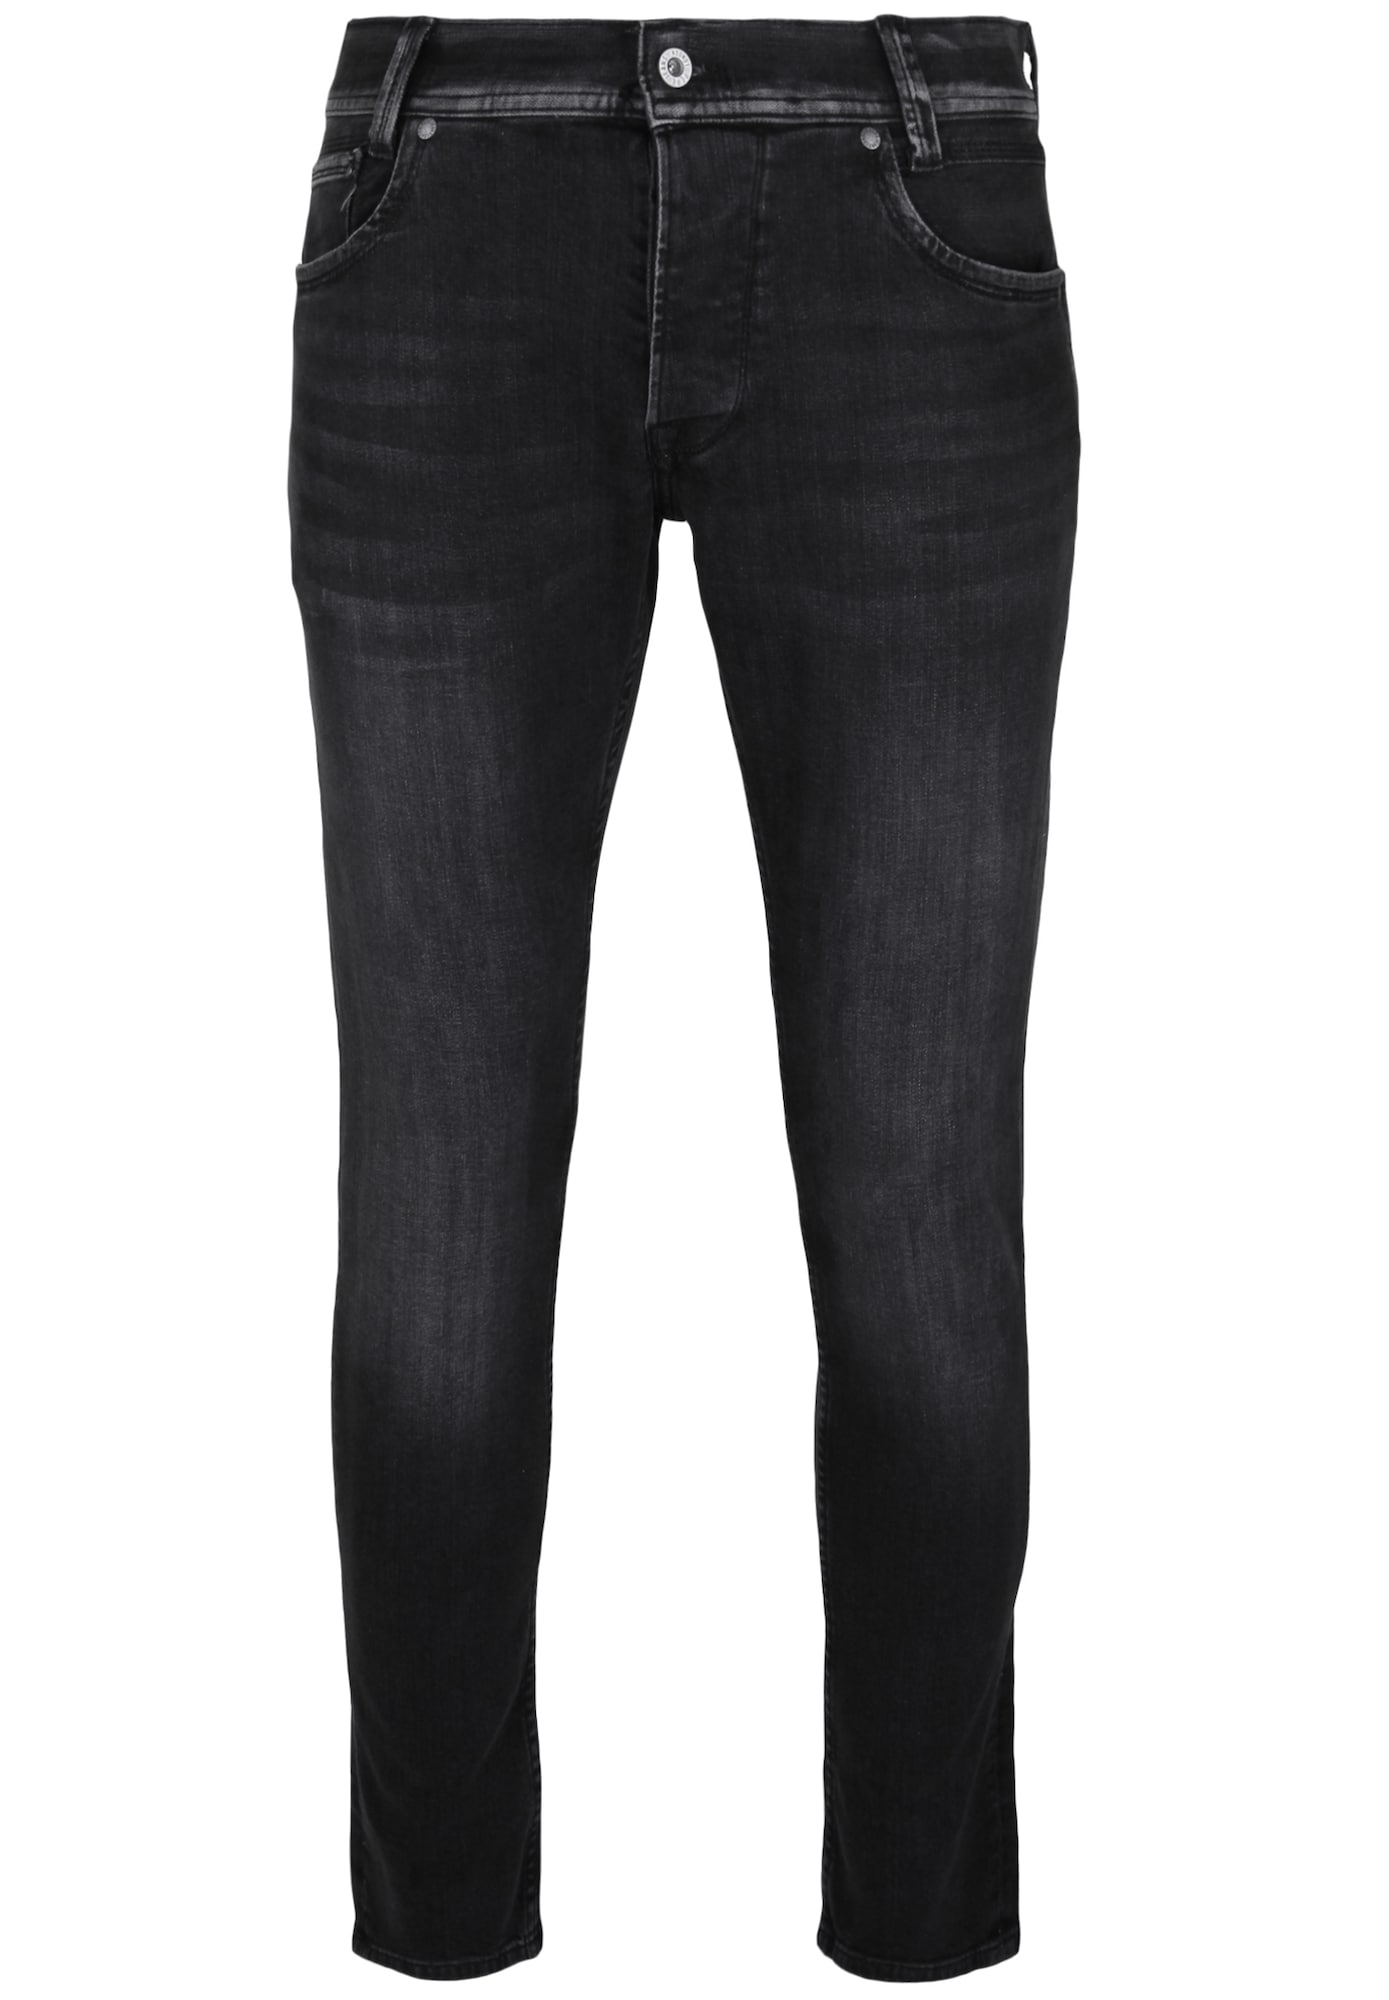 Pepe Jeans Heren Jeans SPIKE grijs